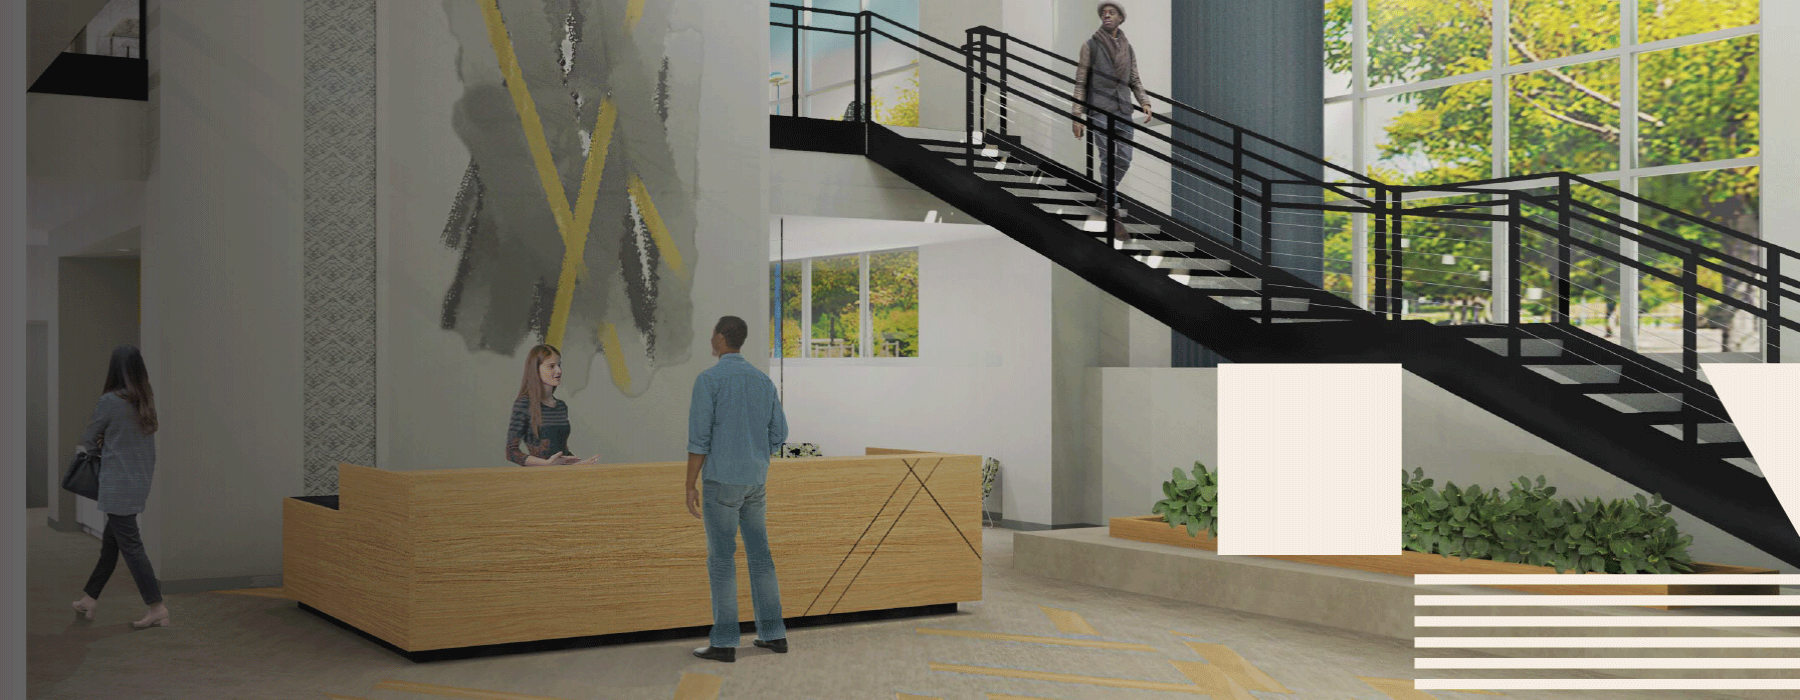 rendering of lobby area